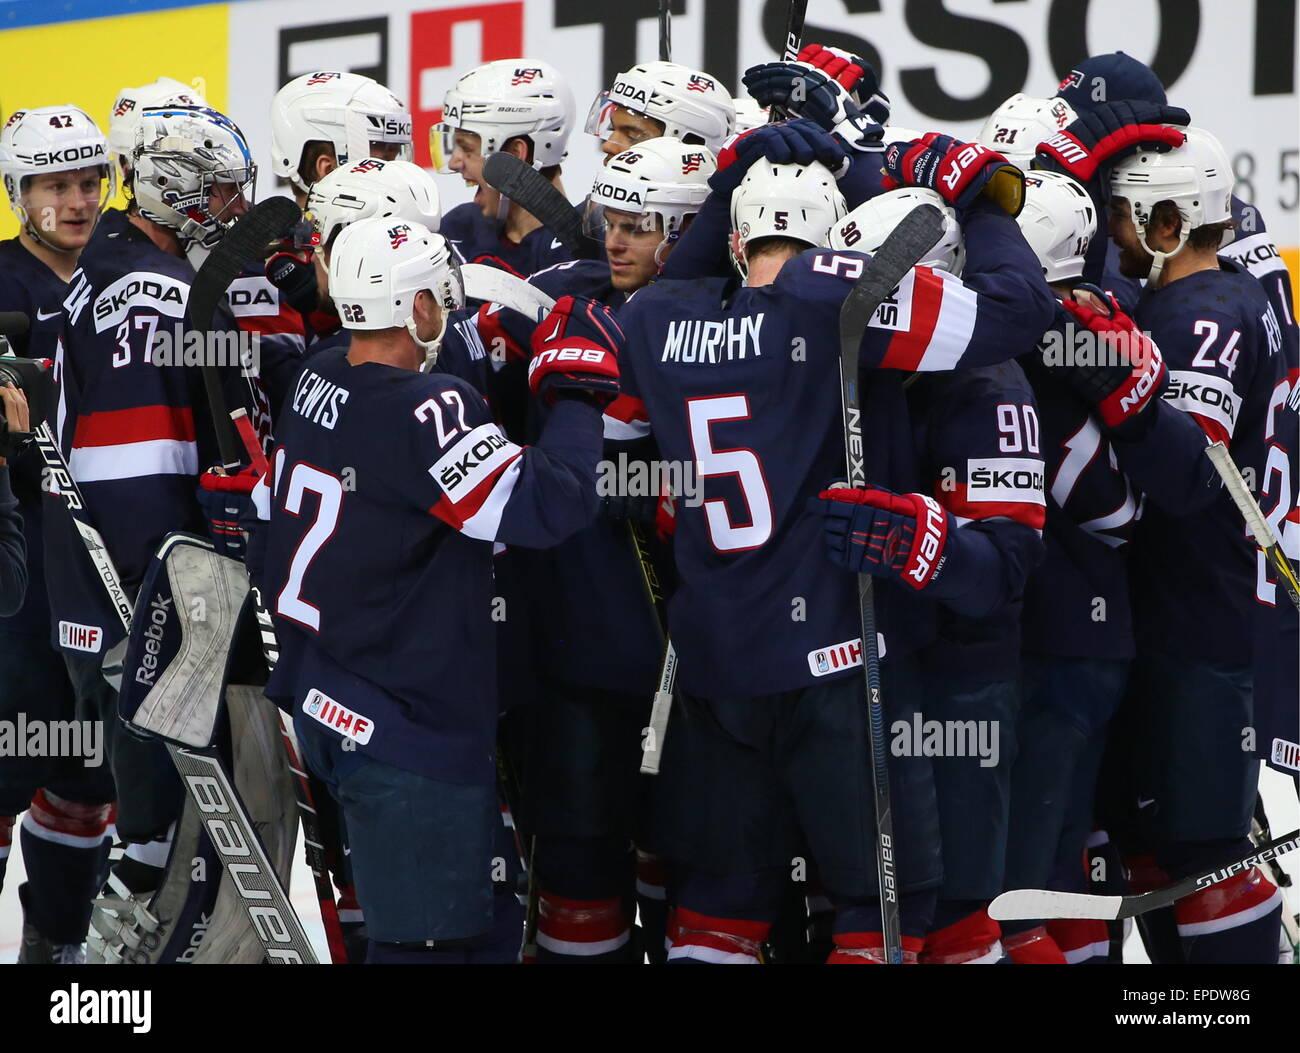 Sammeln & Seltenes Fahne Banner 2015 Ice Hockey World Championship Czech Republic Prag Ostarva #16 Eishockey